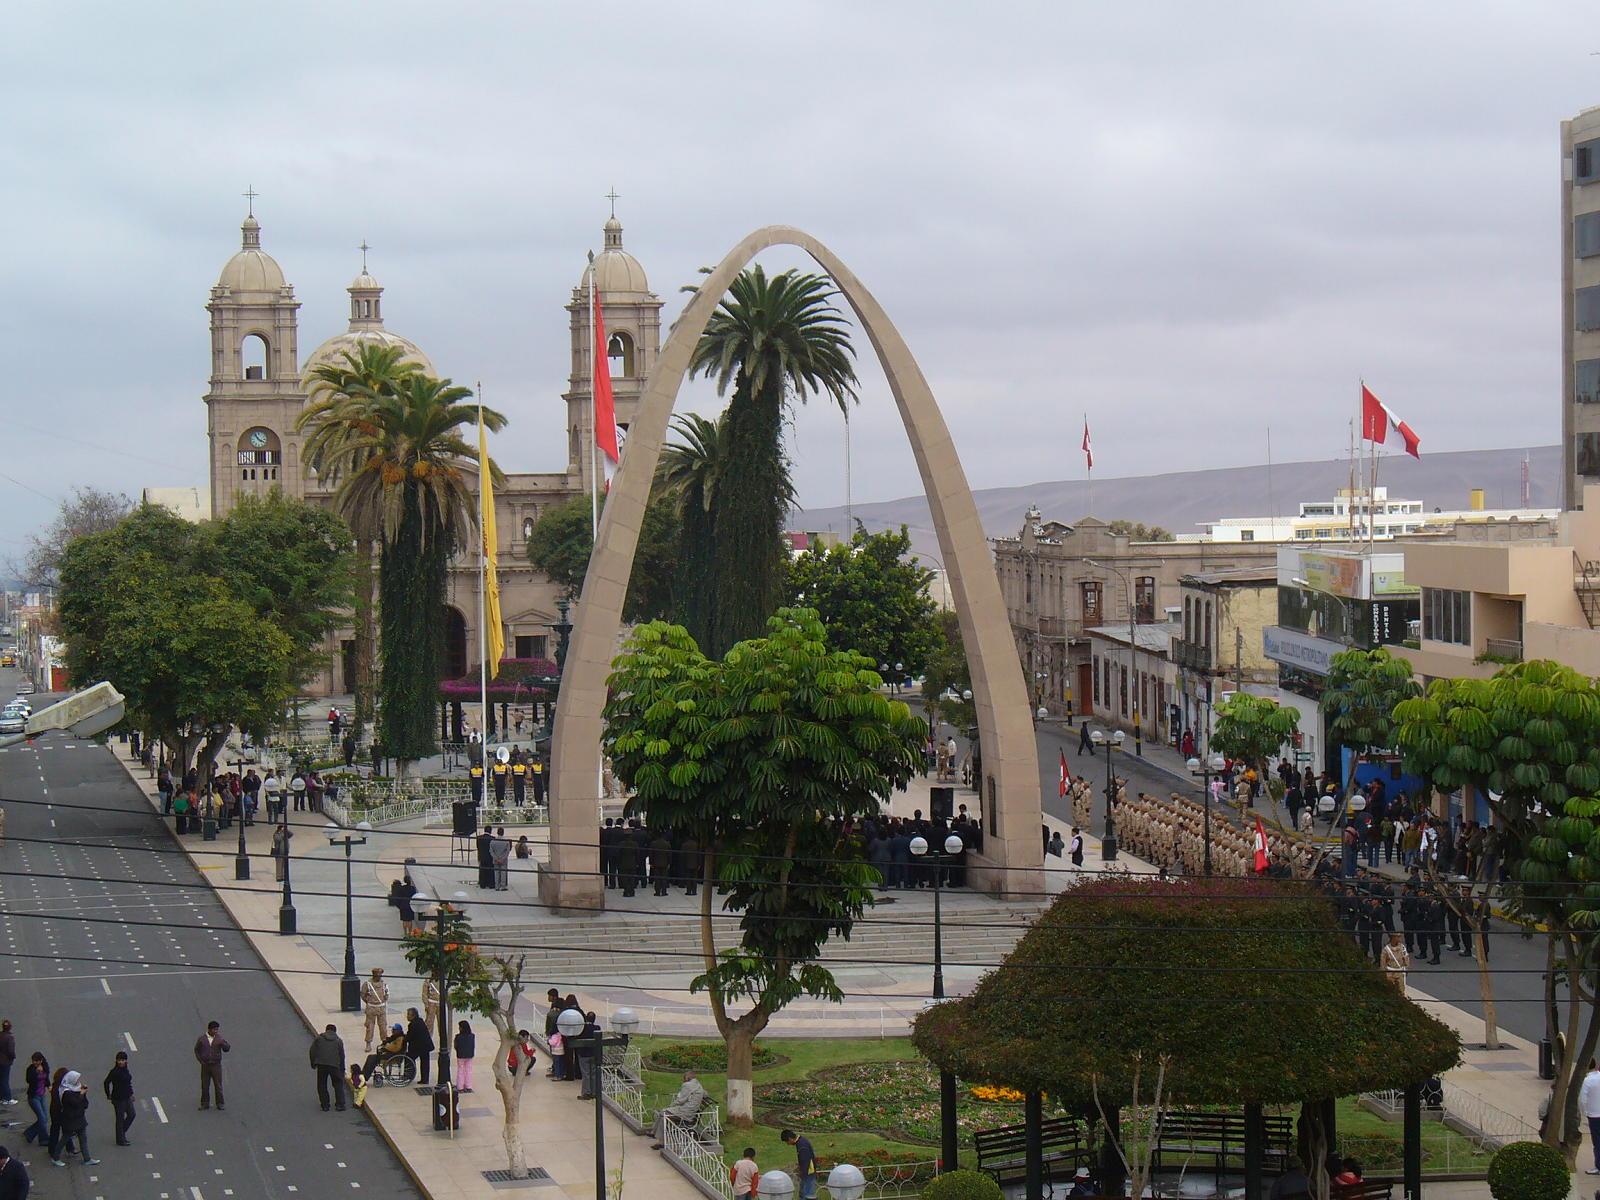 Encuentro Nacional Descentralizado de Autoridades Municipales – Tacna 2017